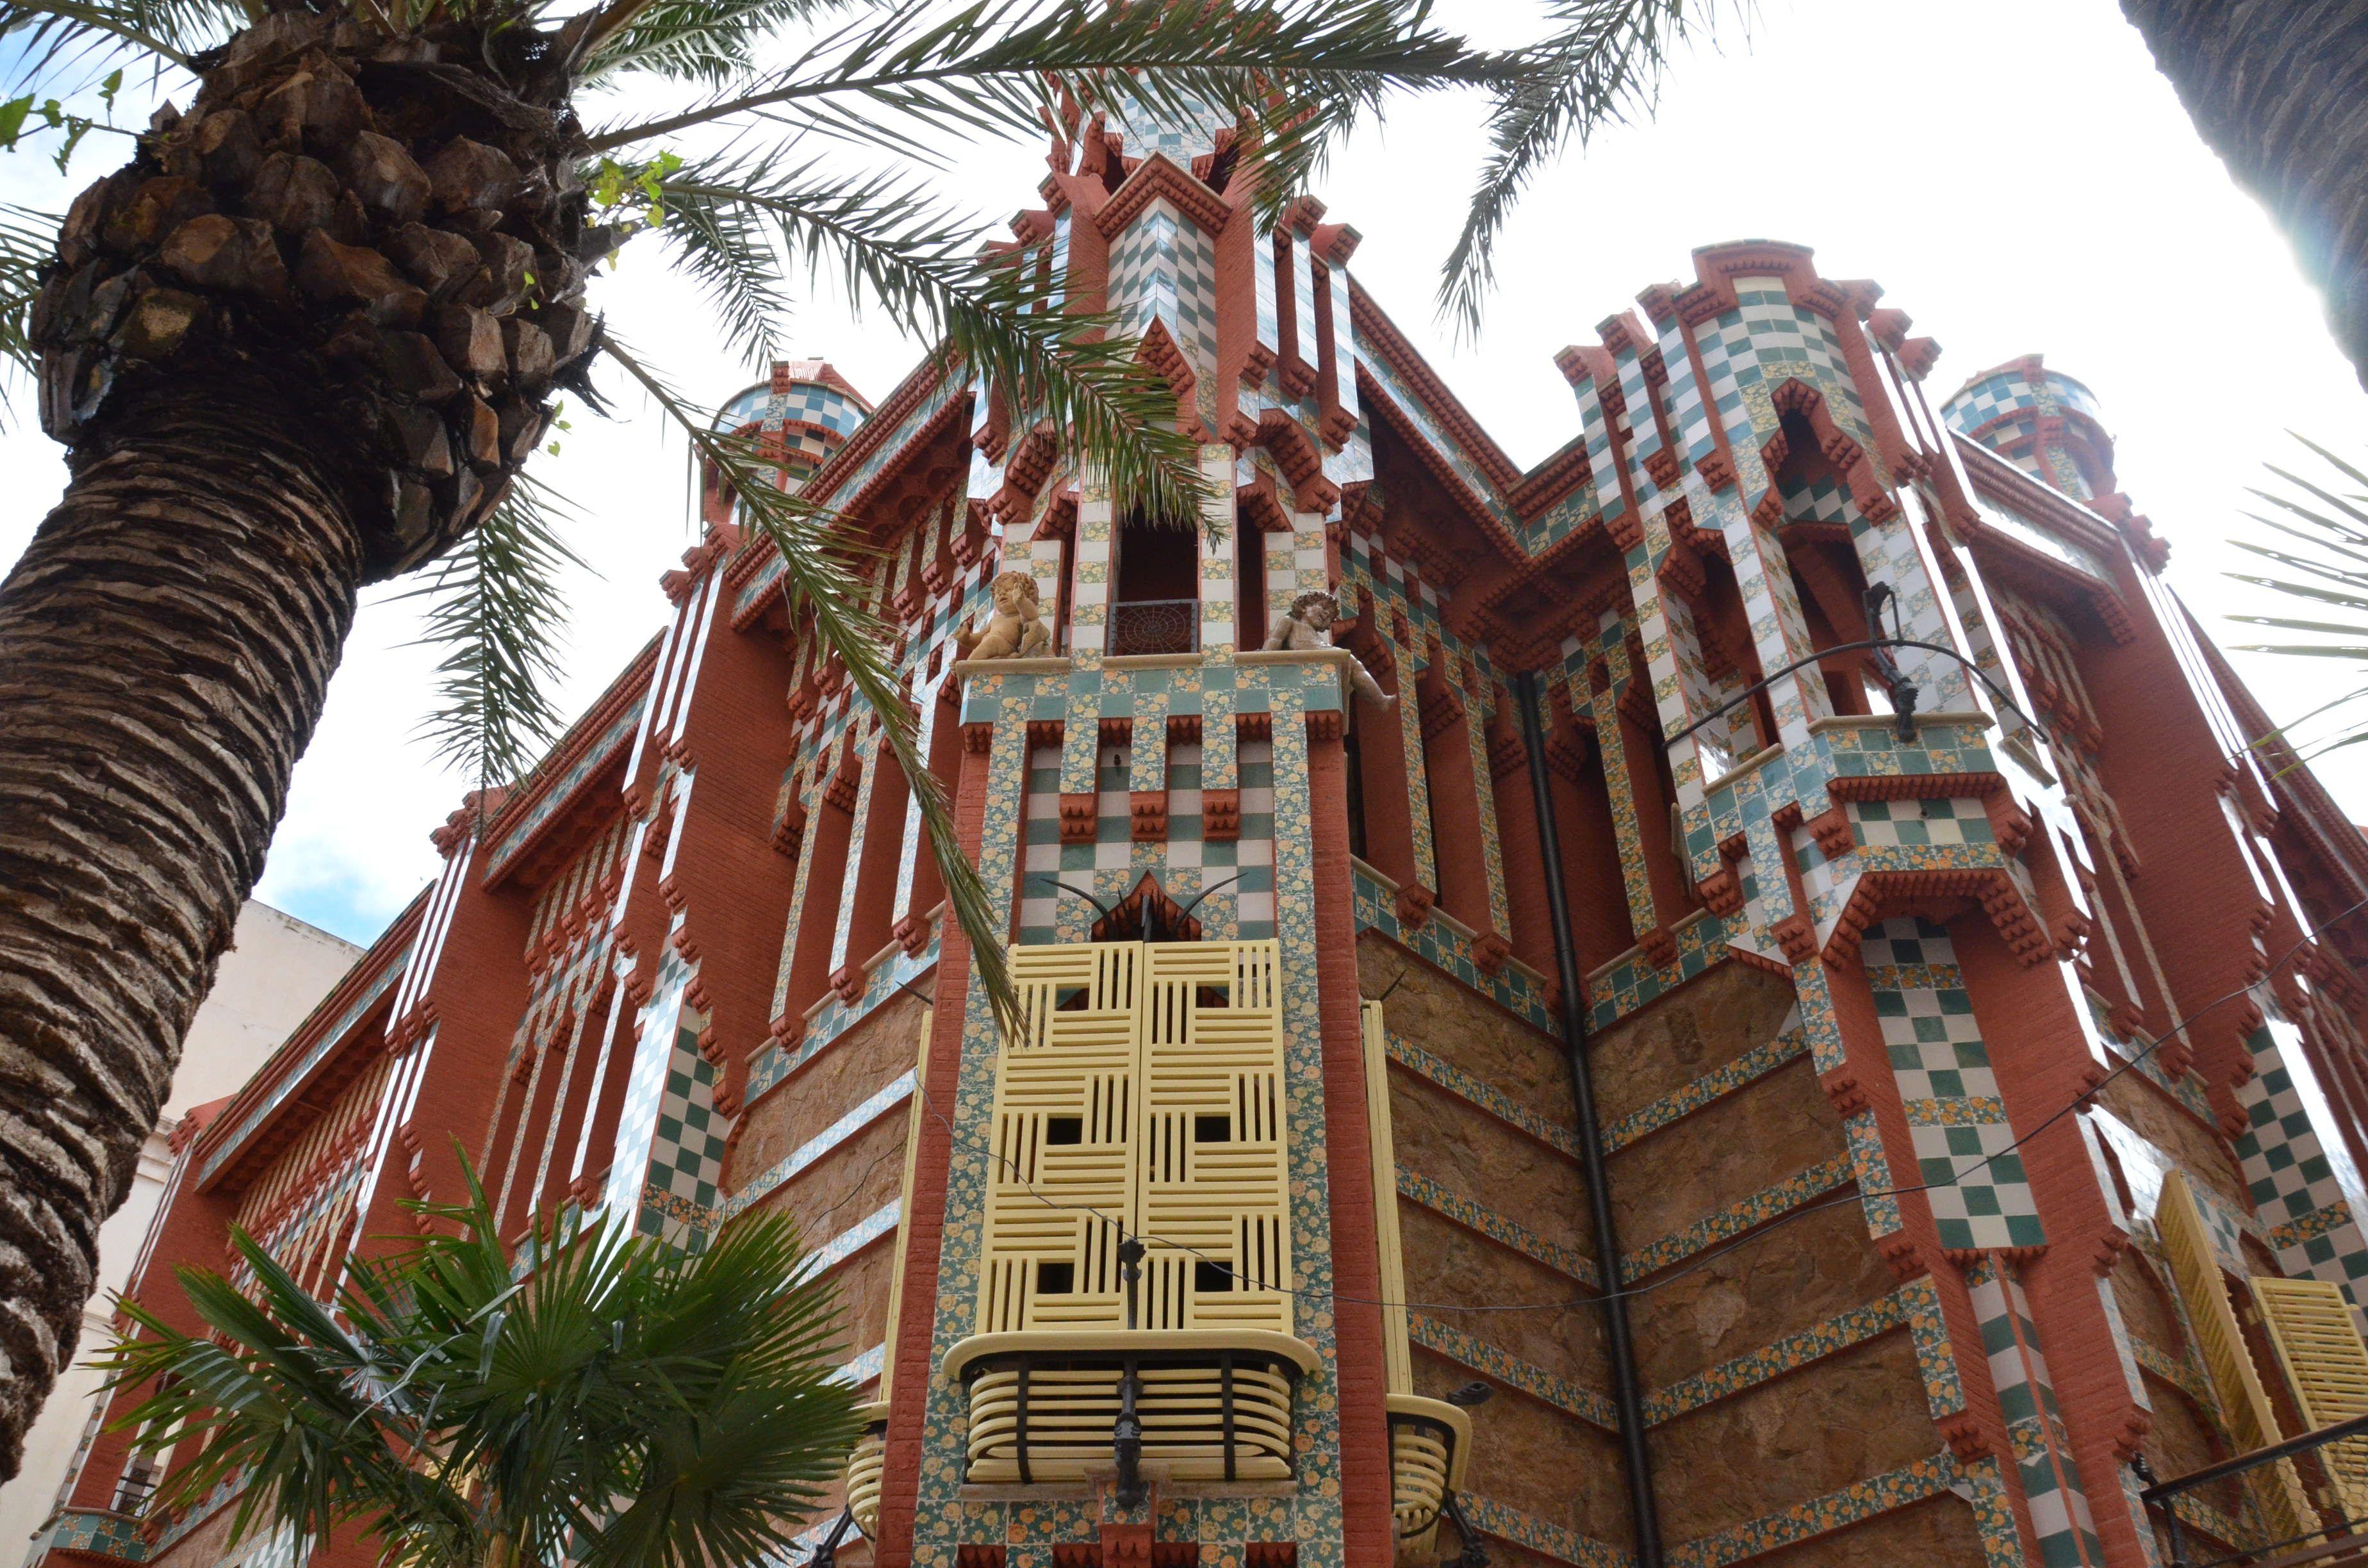 Casa Museo Gaudi.Casa Vicens Gaudi House Museum Barcelona All Year